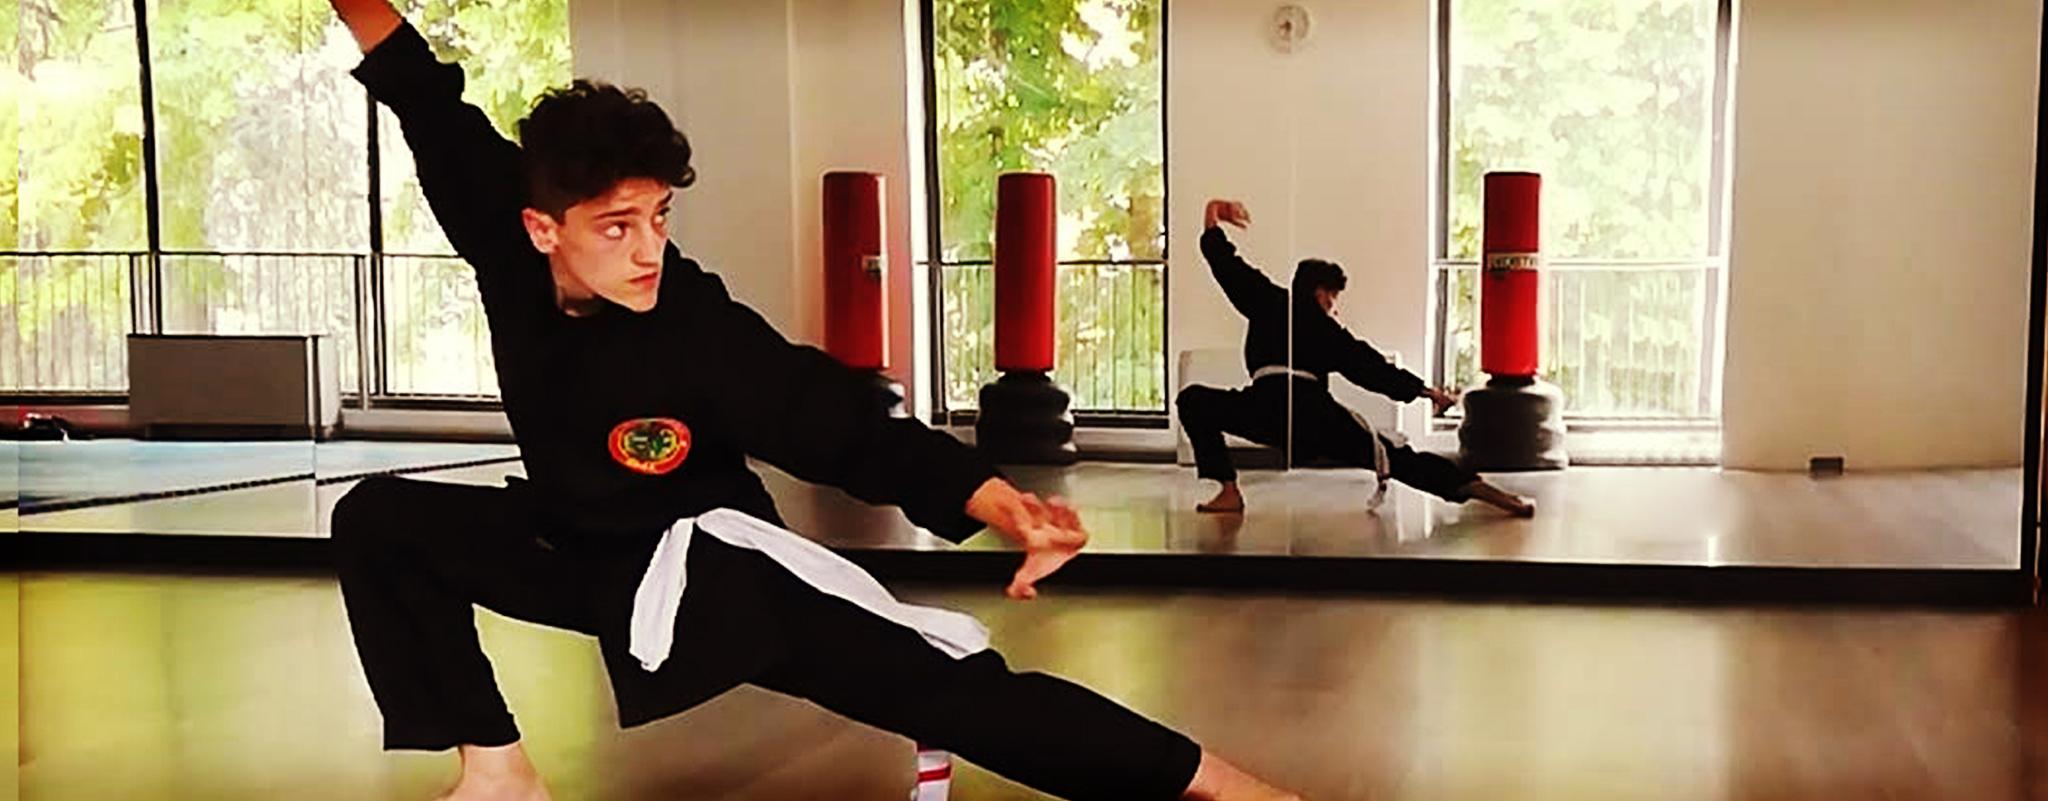 Scuola Kung fu Milano 3